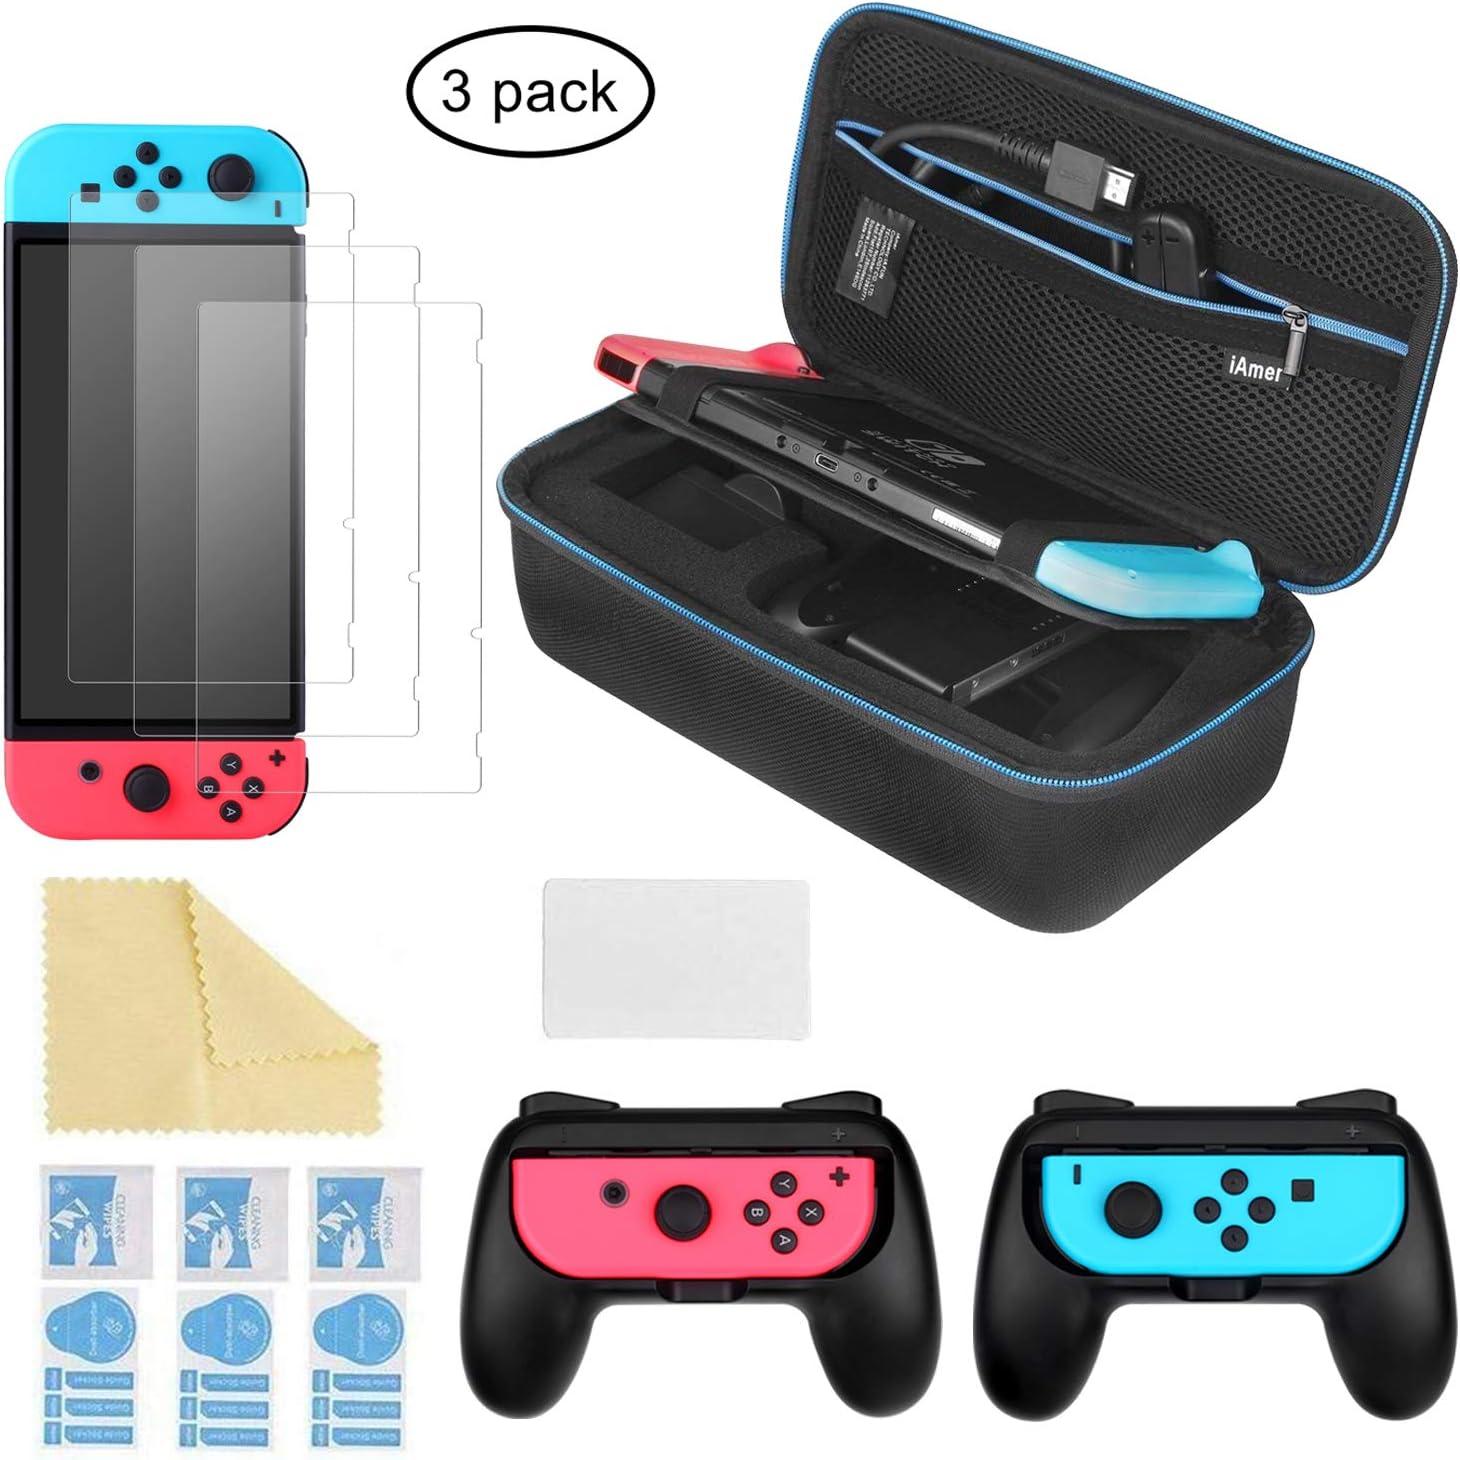 iAmer 6 en 1 Accesorios para Nintendo Switch,Funda para Nintendo Switch,Mandos Joy-con para Nintendo Switch,3 Protectores de Pantalla: Amazon.es: Electrónica